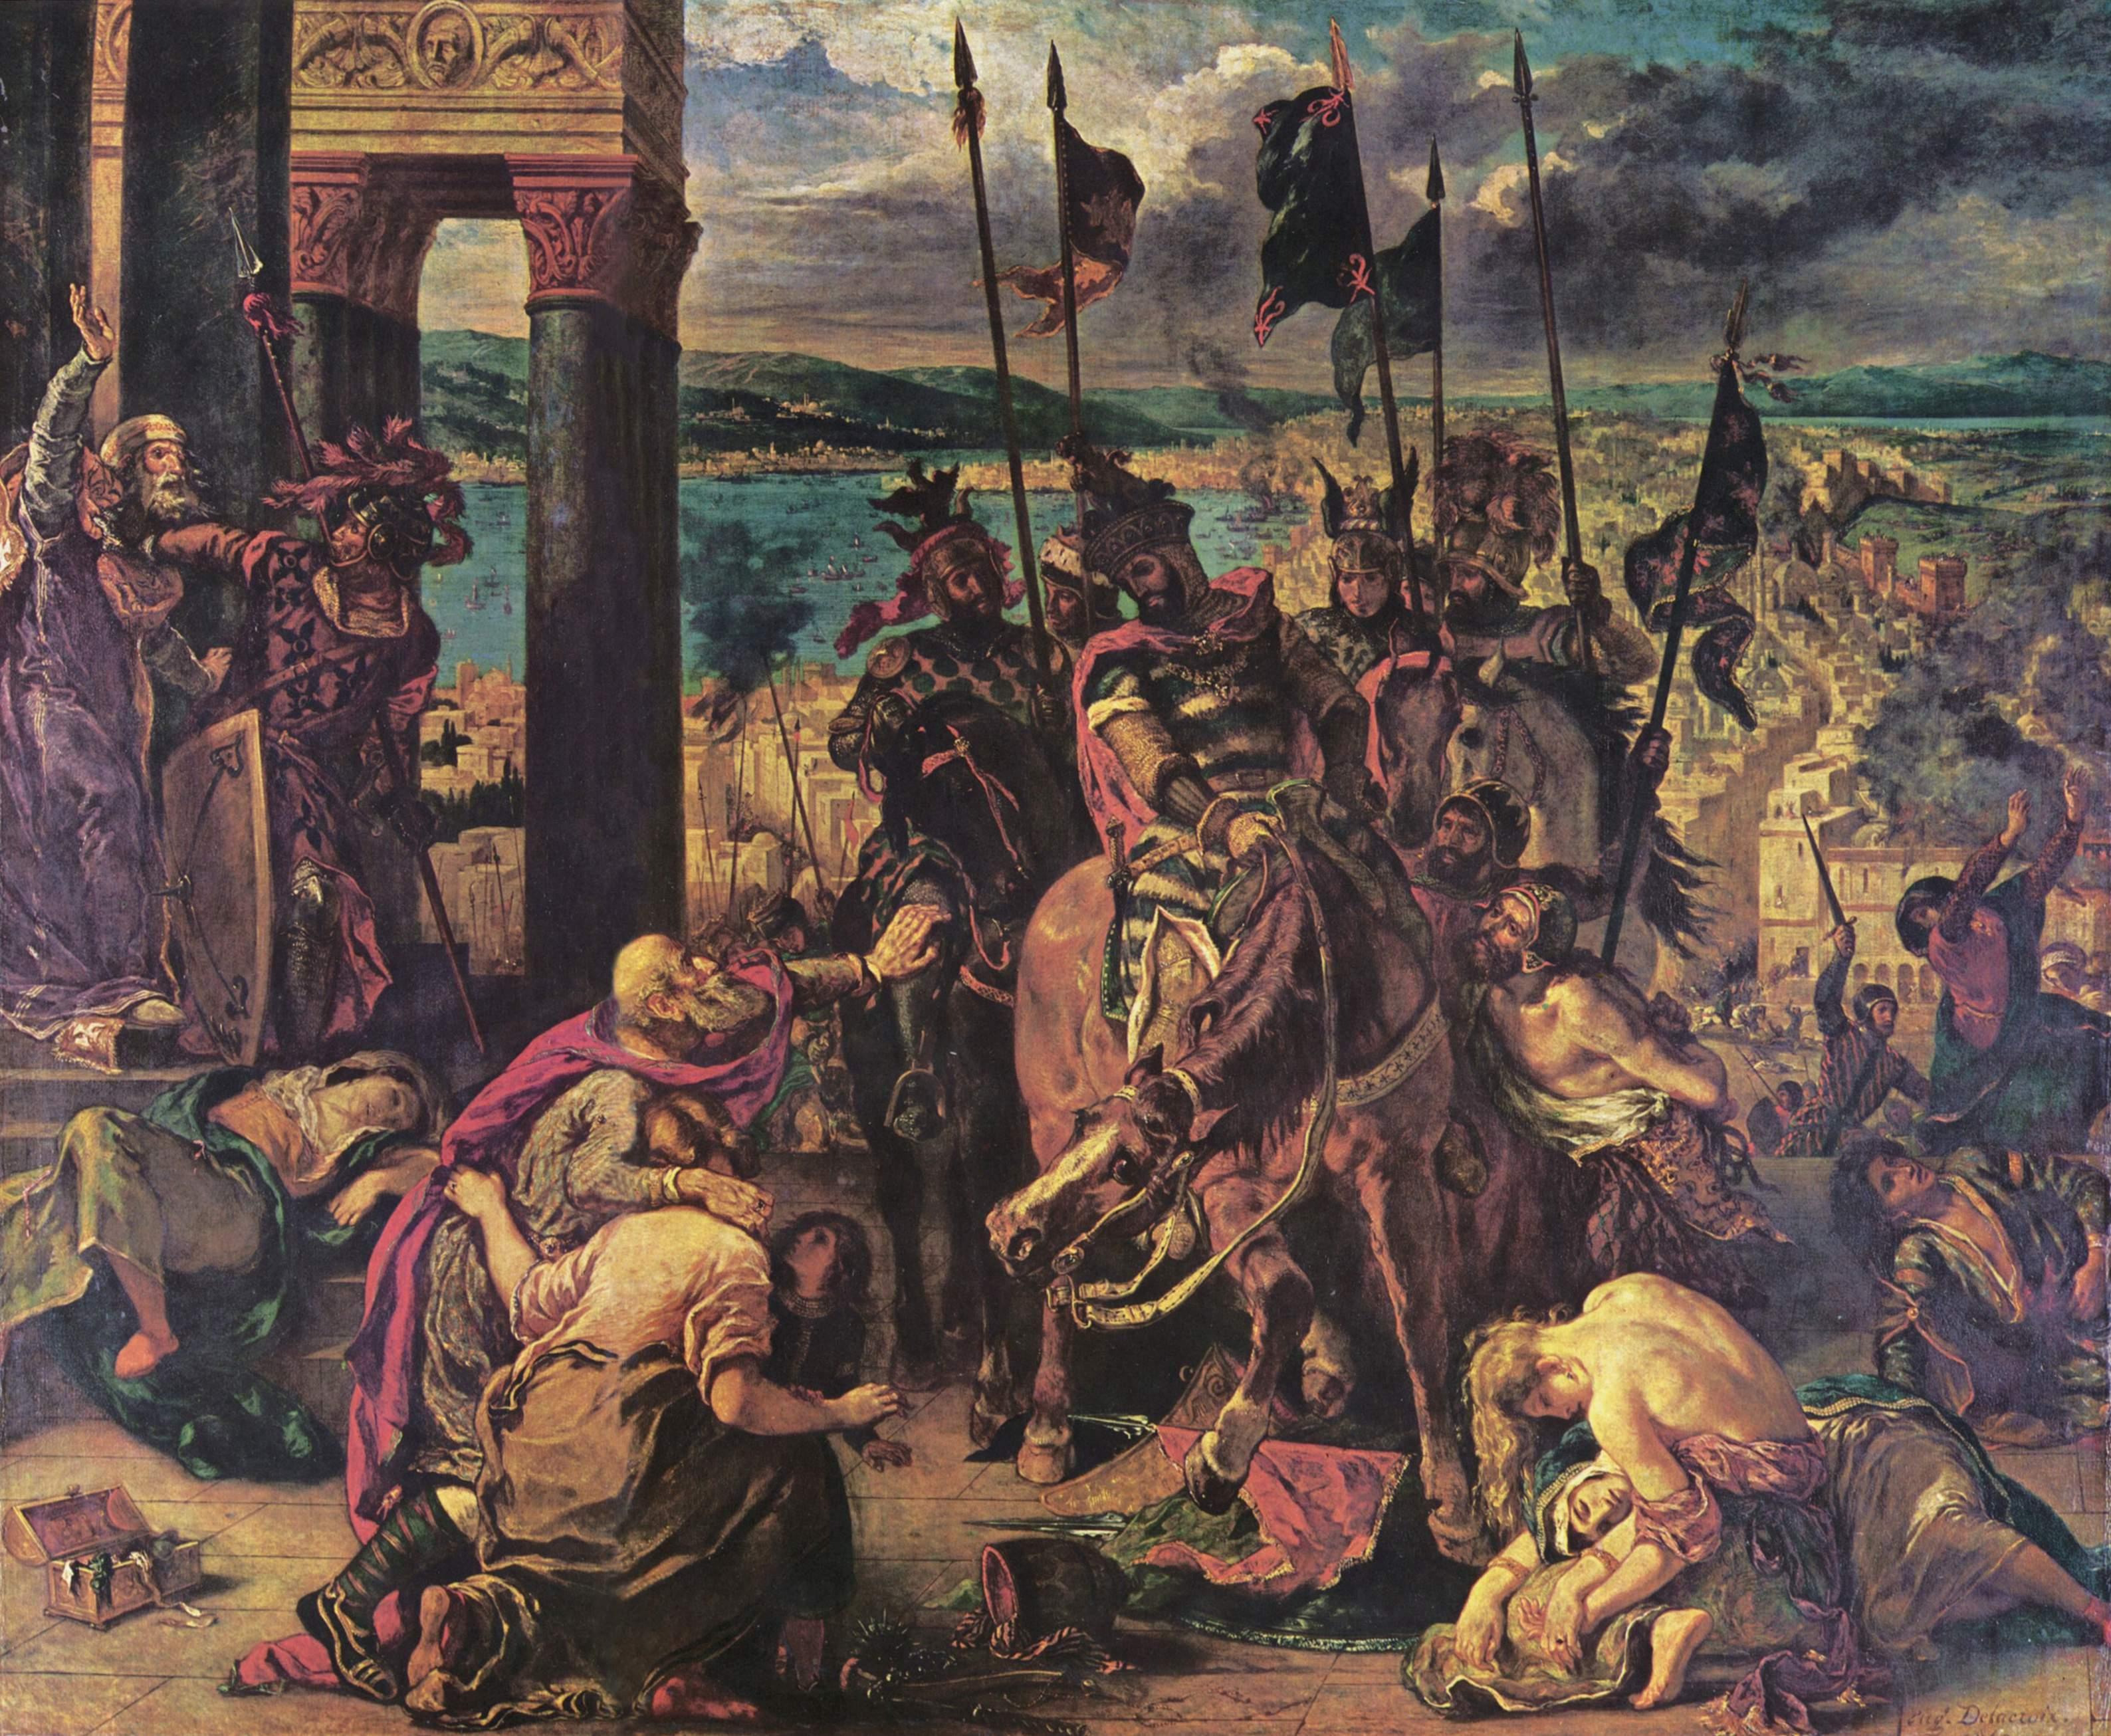 Взятие Константинополя крестоносцами, Делакруа Эжен Фердинанд Виктор